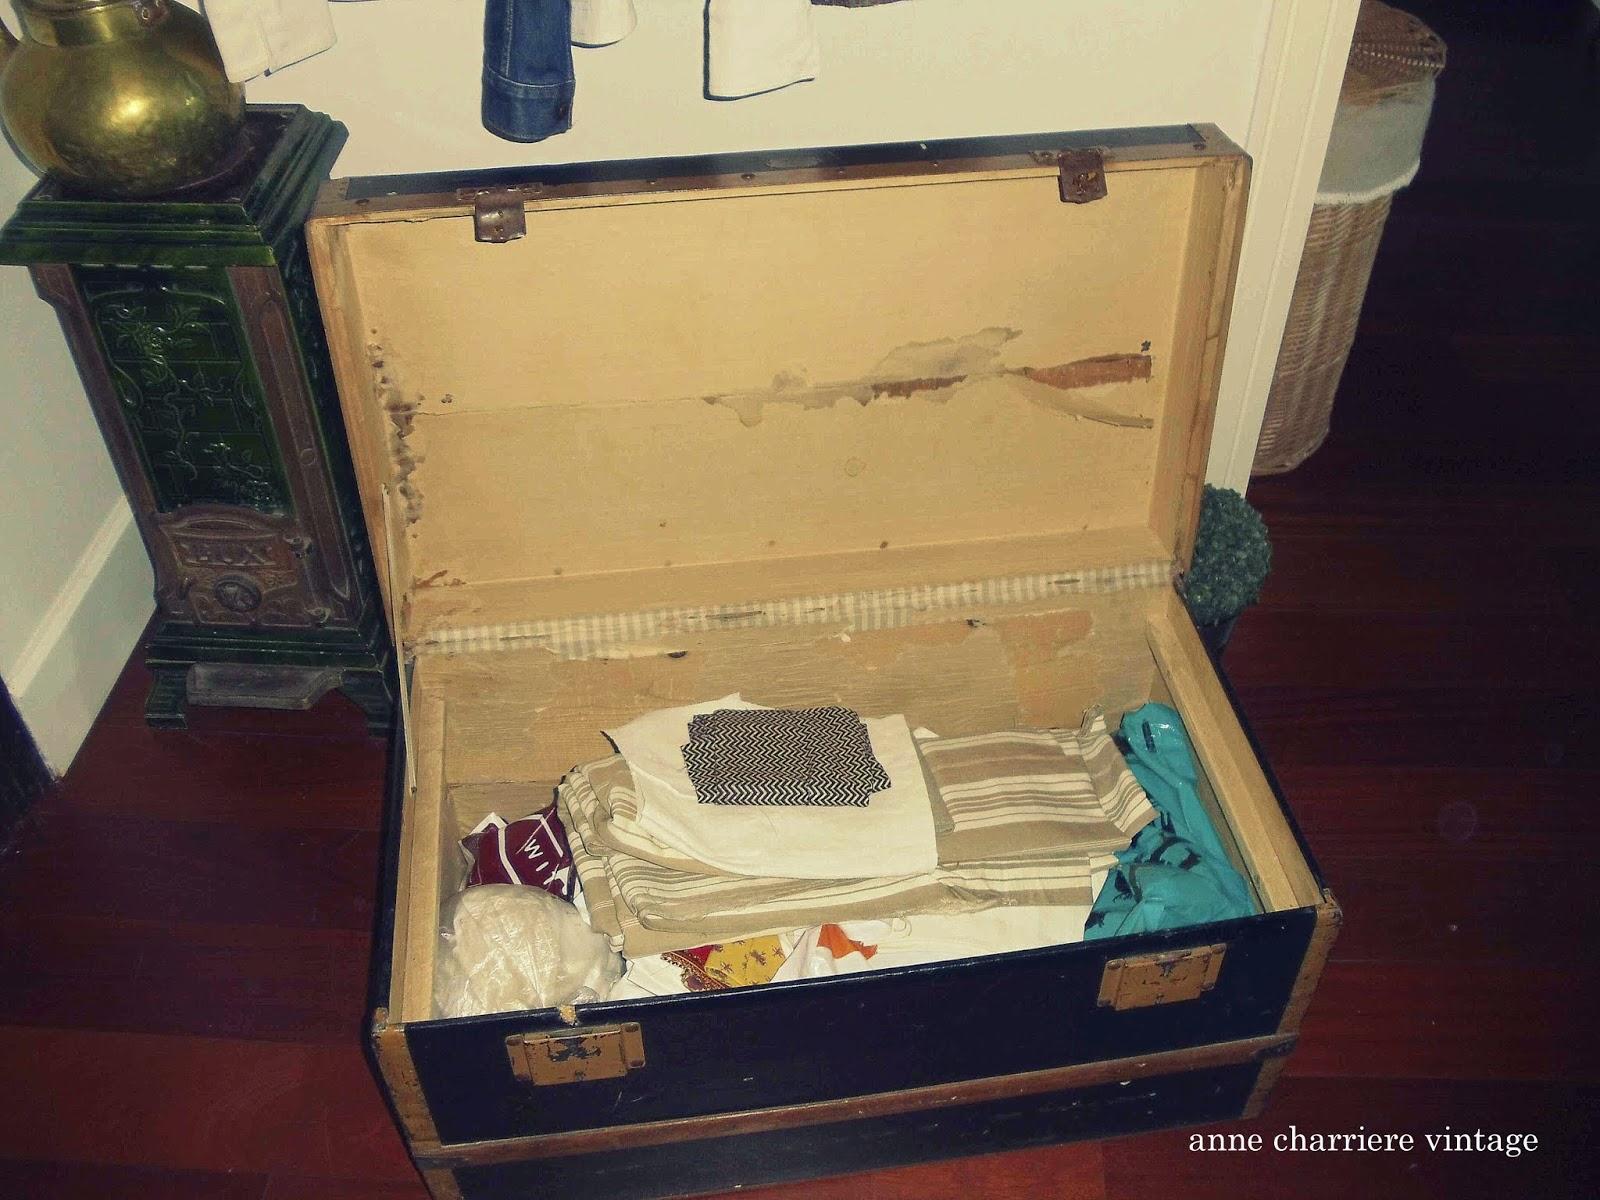 anne charriere, forrar baúl antiguo, tela, papel,